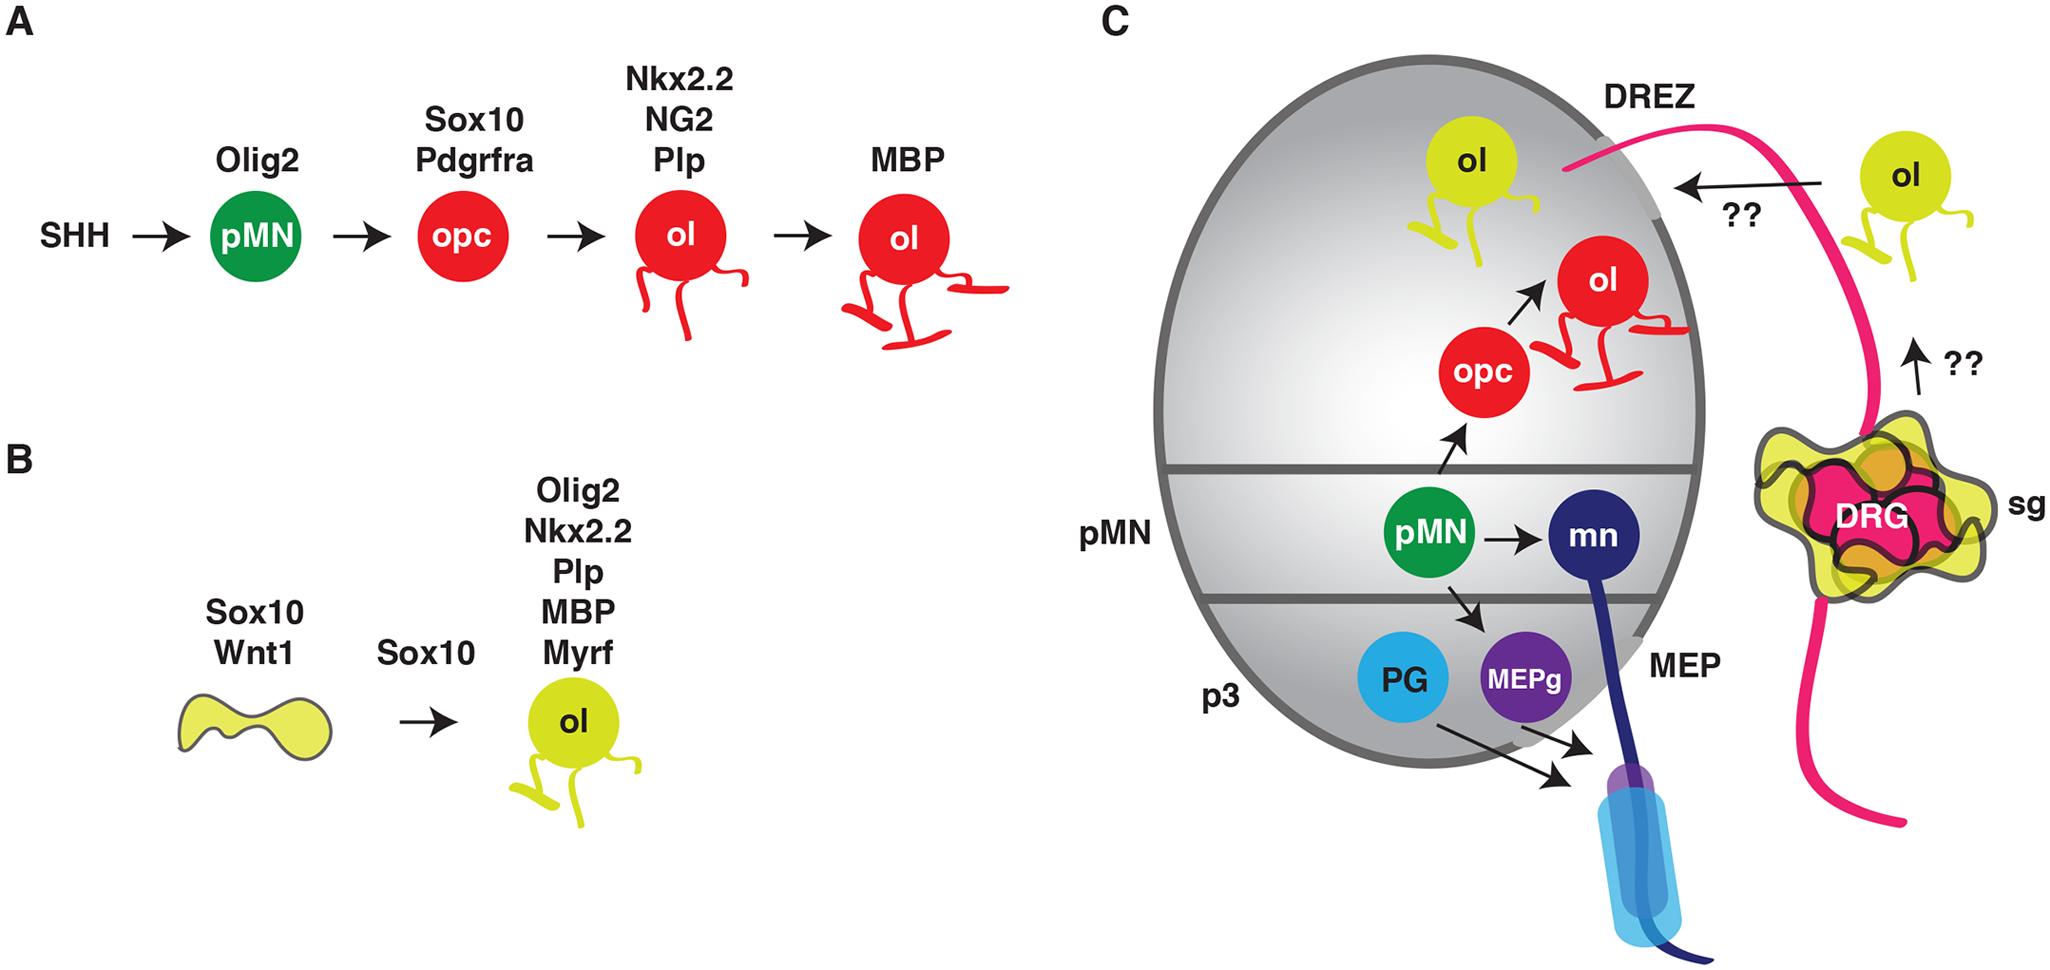 Conversion of satellite glia into oligodendrocyte-like cells.